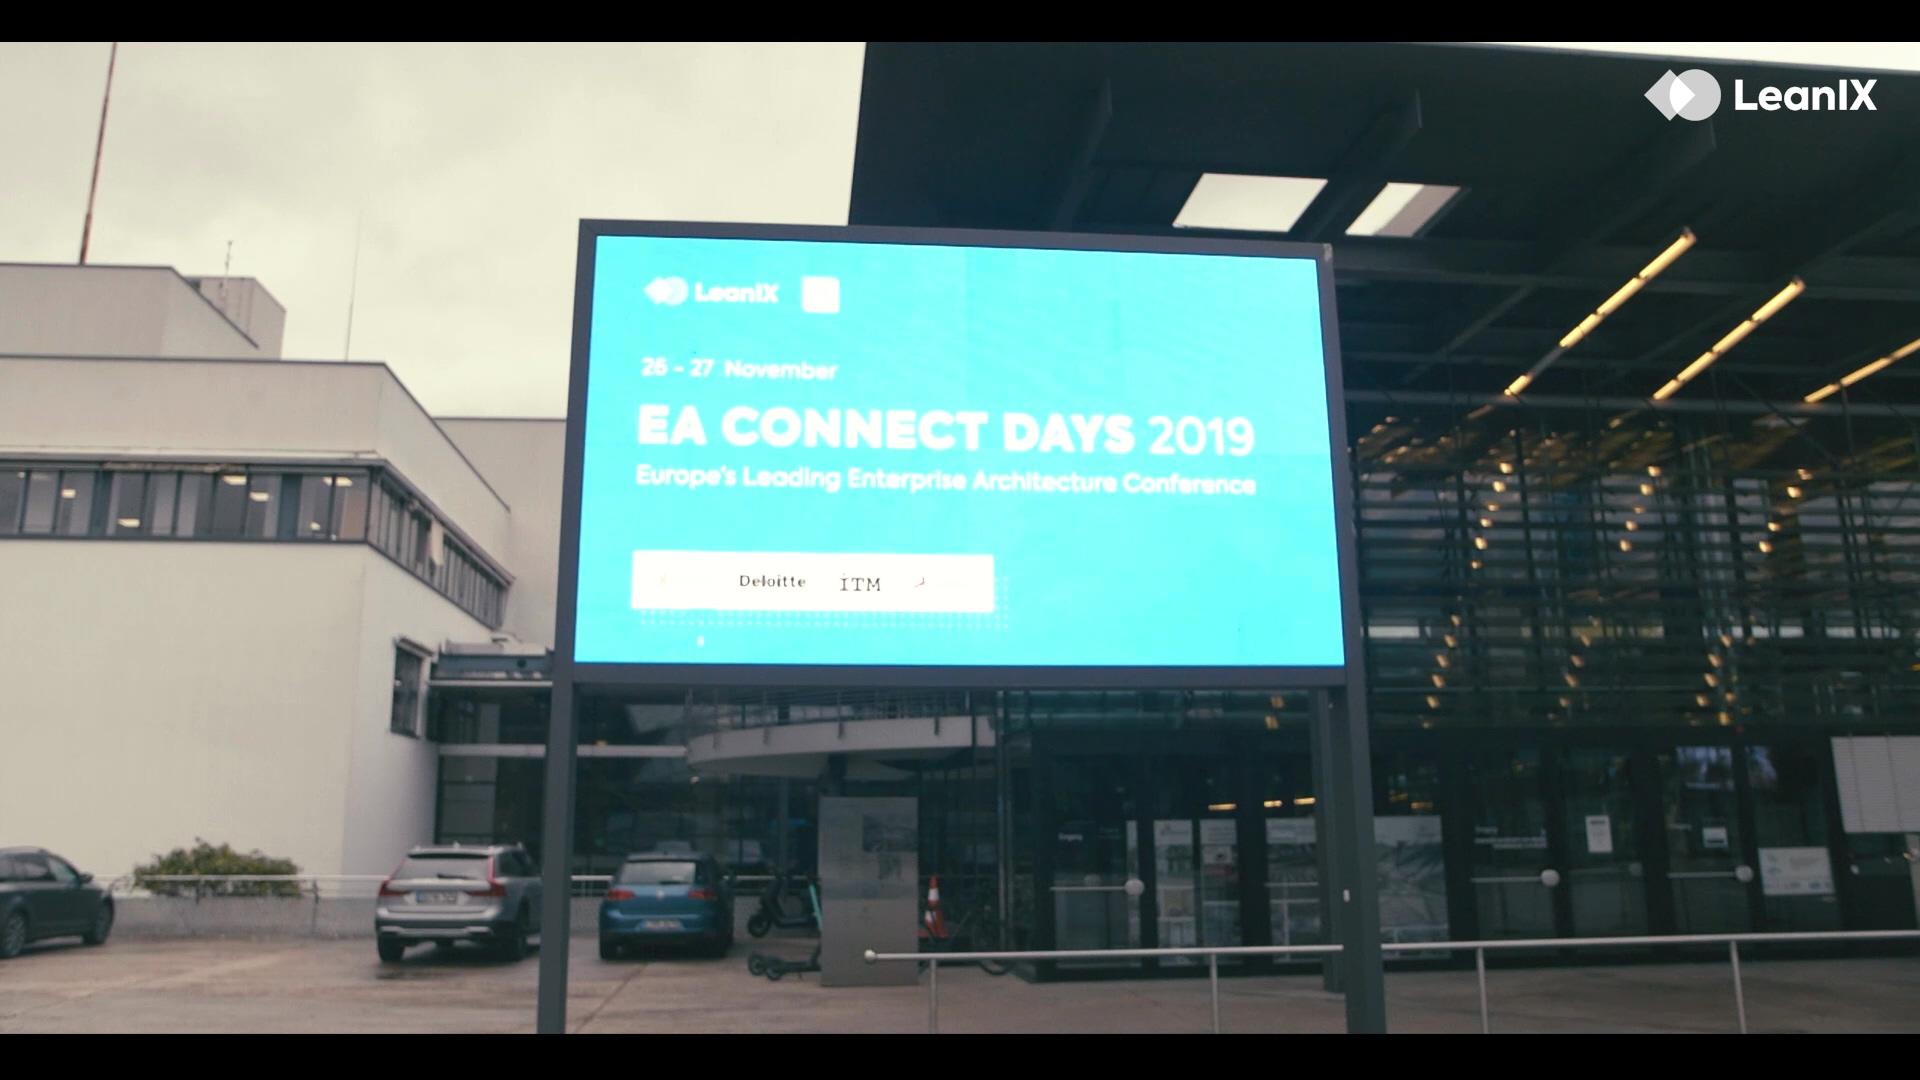 EA_Connect_Days_Eventdoku_Dauerlogo